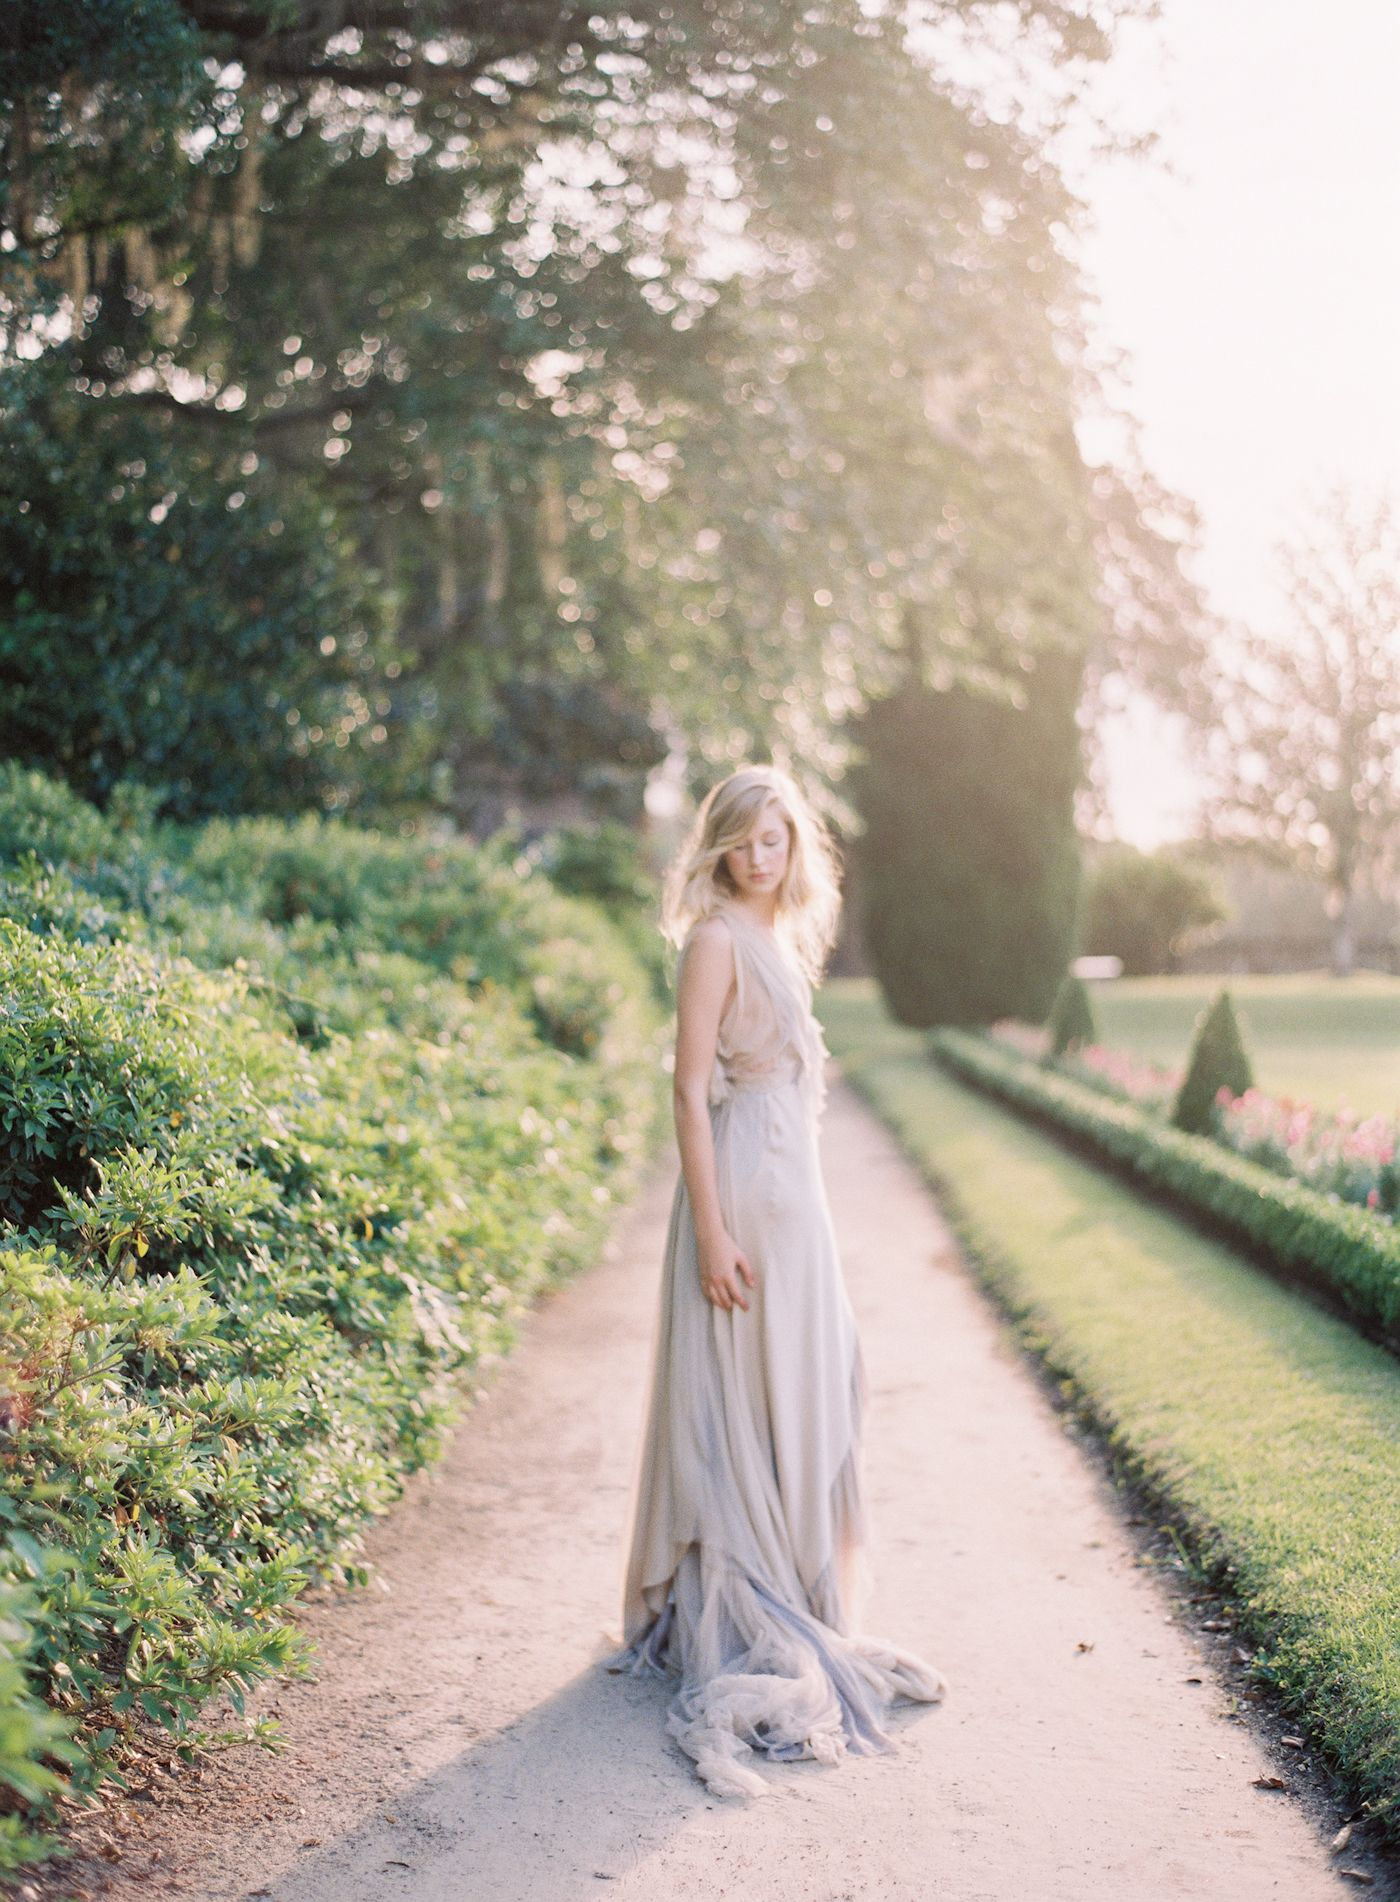 Forage Fern Wedding Photography Inspiration Film Wedding Photography Bride